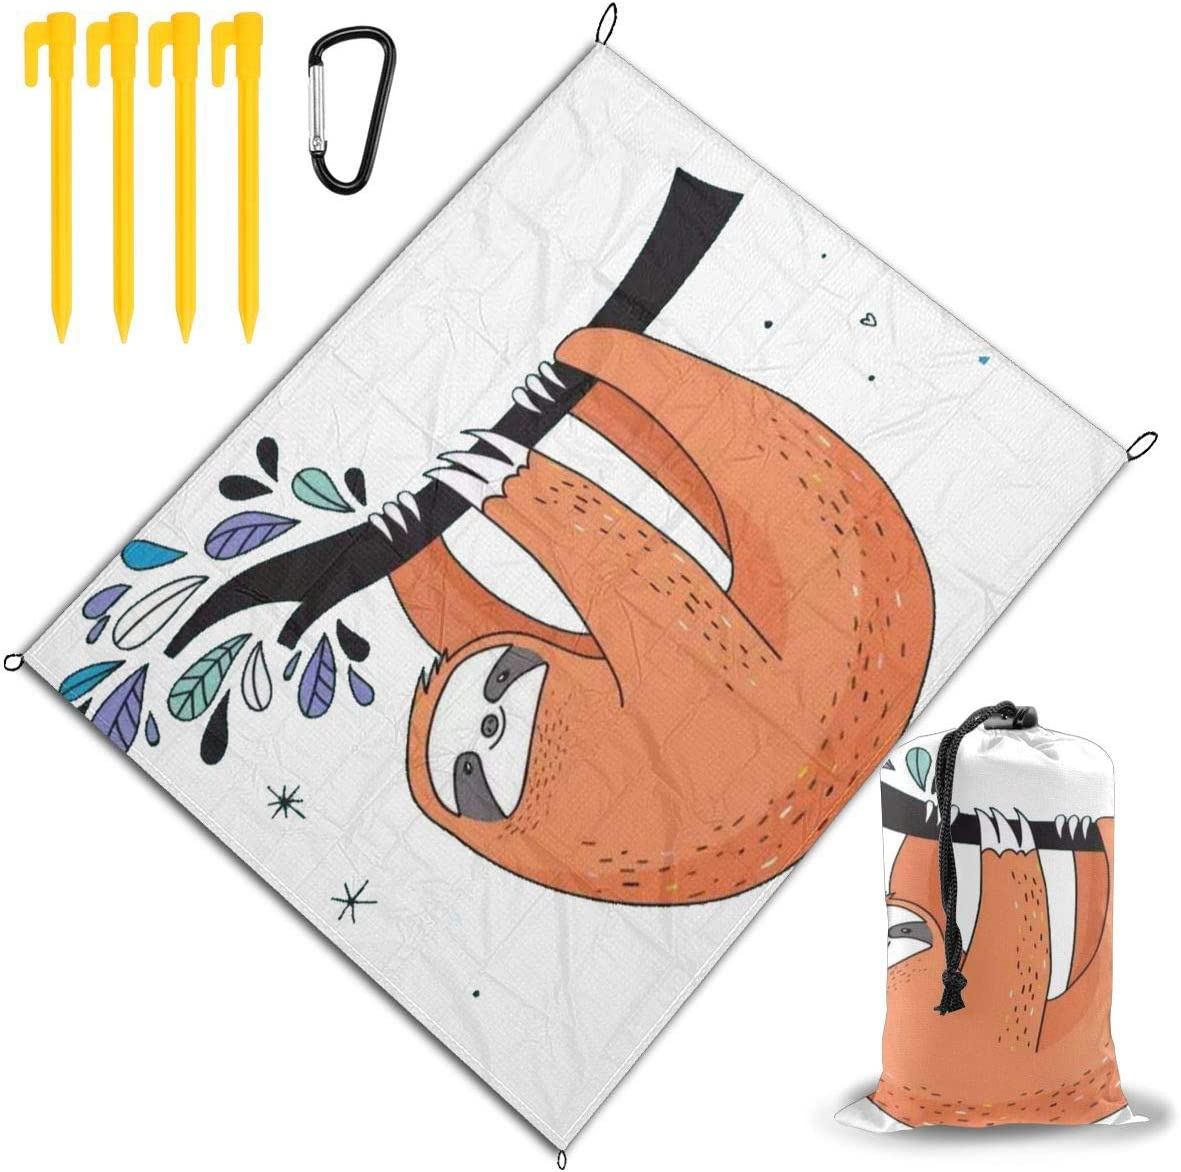 JEKYDOSD Sloth Green Printed Picnic Mat,Travel Outdoor Beach Blanket Durable Waterproof Sand Beach Mat Blanket for Travel Camping Hiking 67